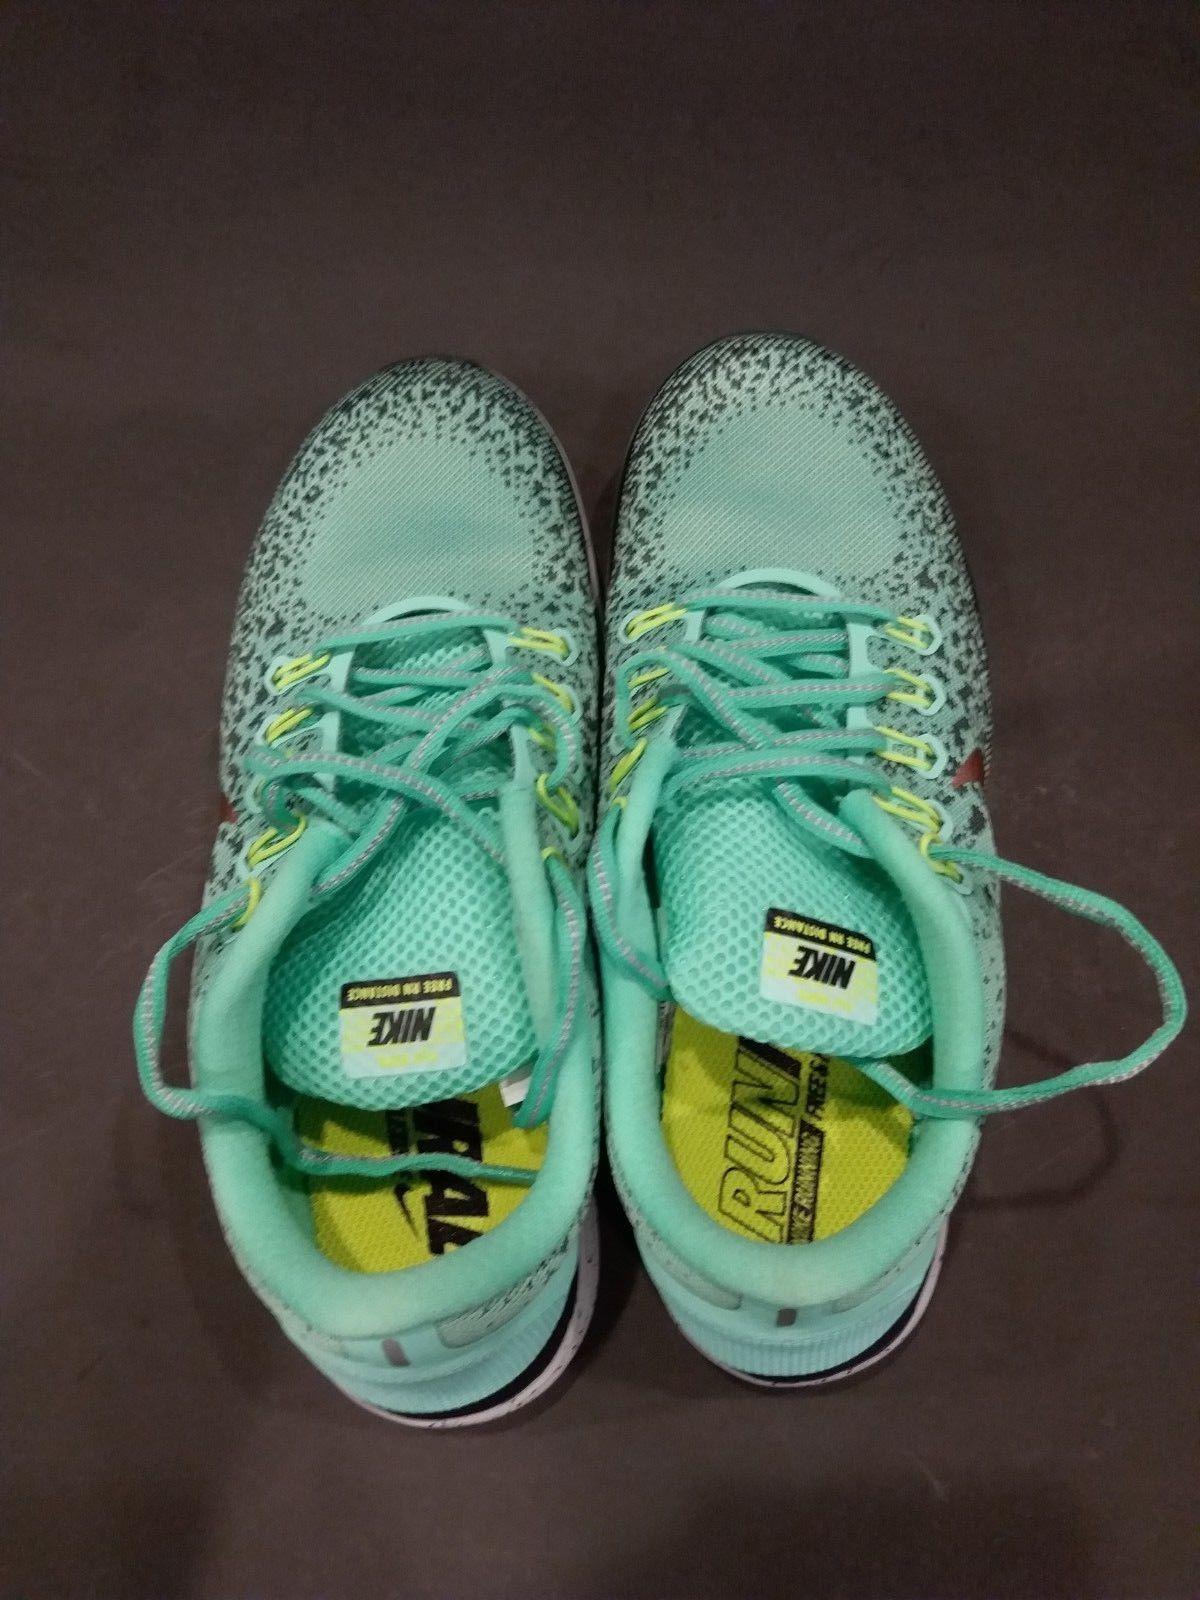 buy popular 3df96 b346e New Womens Nike Free RN Distance Shield Shoes in Green Glow 849661 300 SZ-8